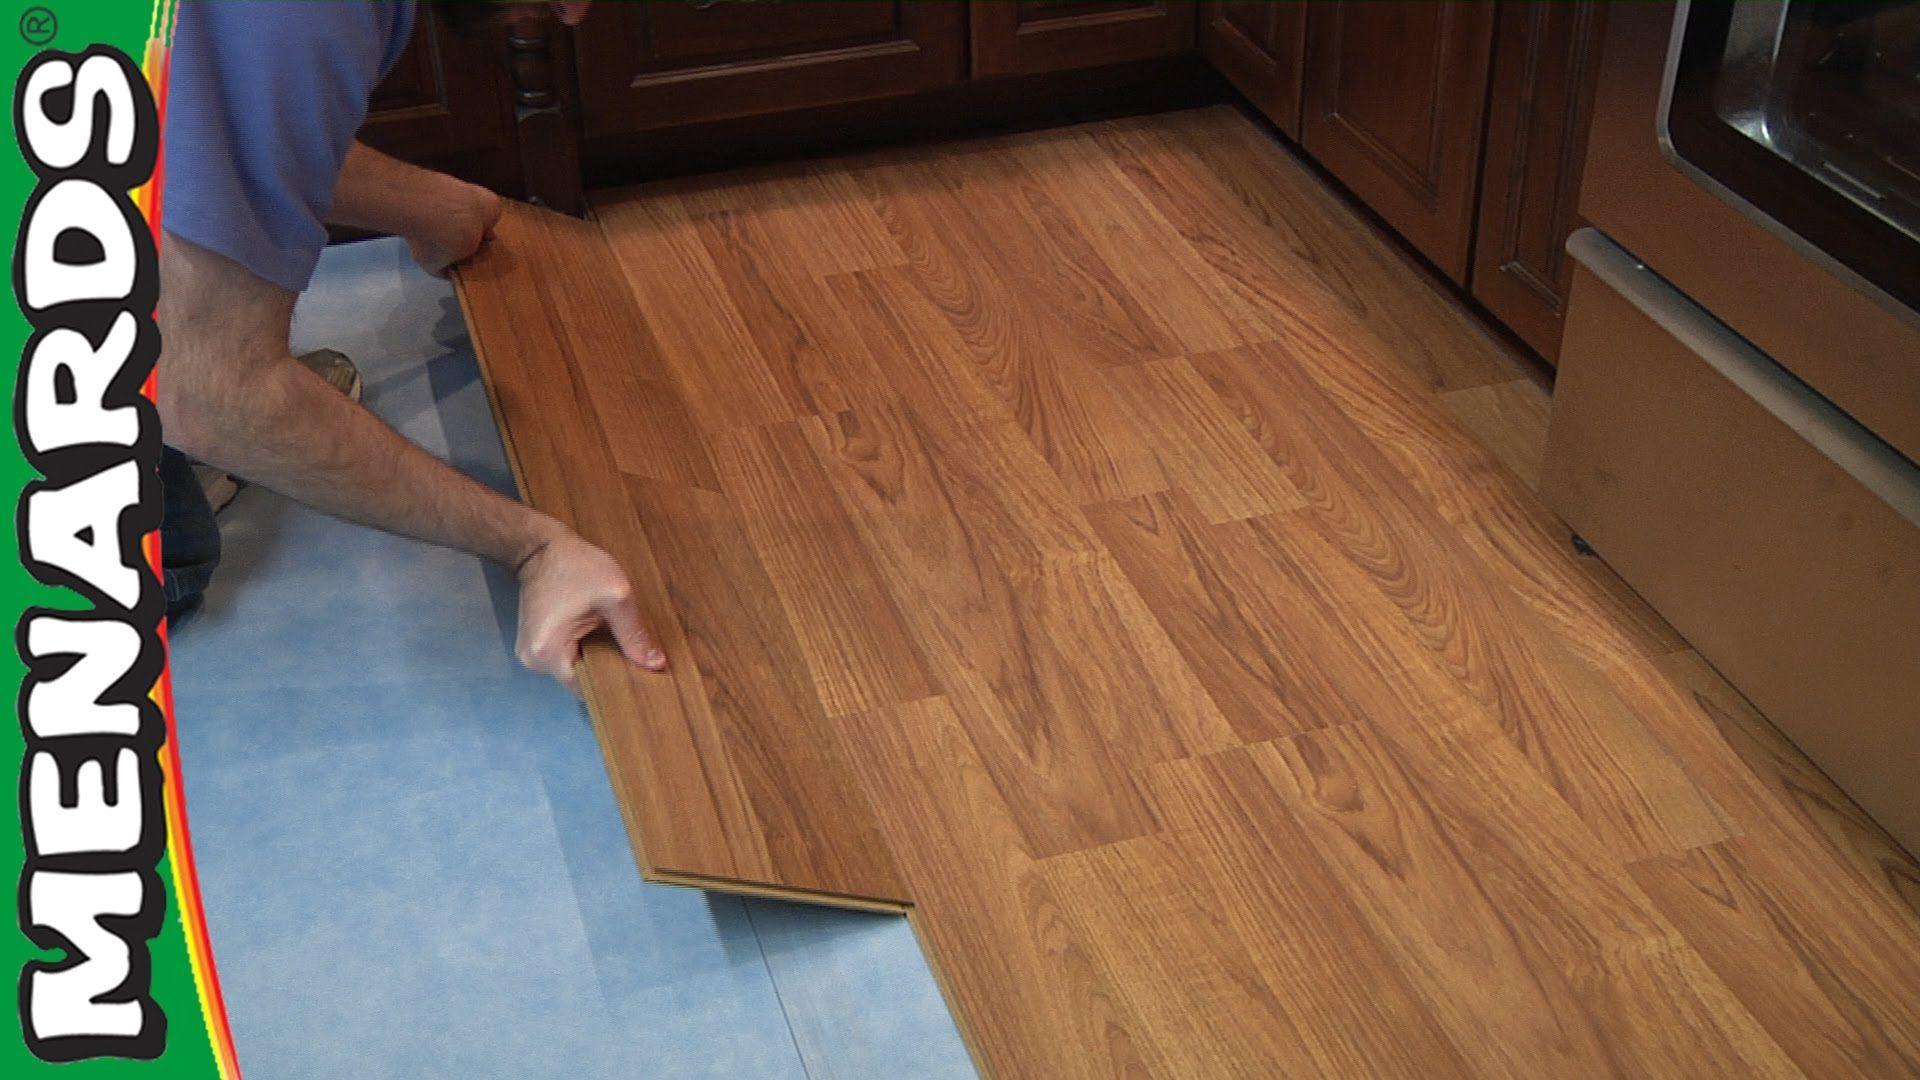 Laminate Wood Flooring Buying Guide at Menards Wood